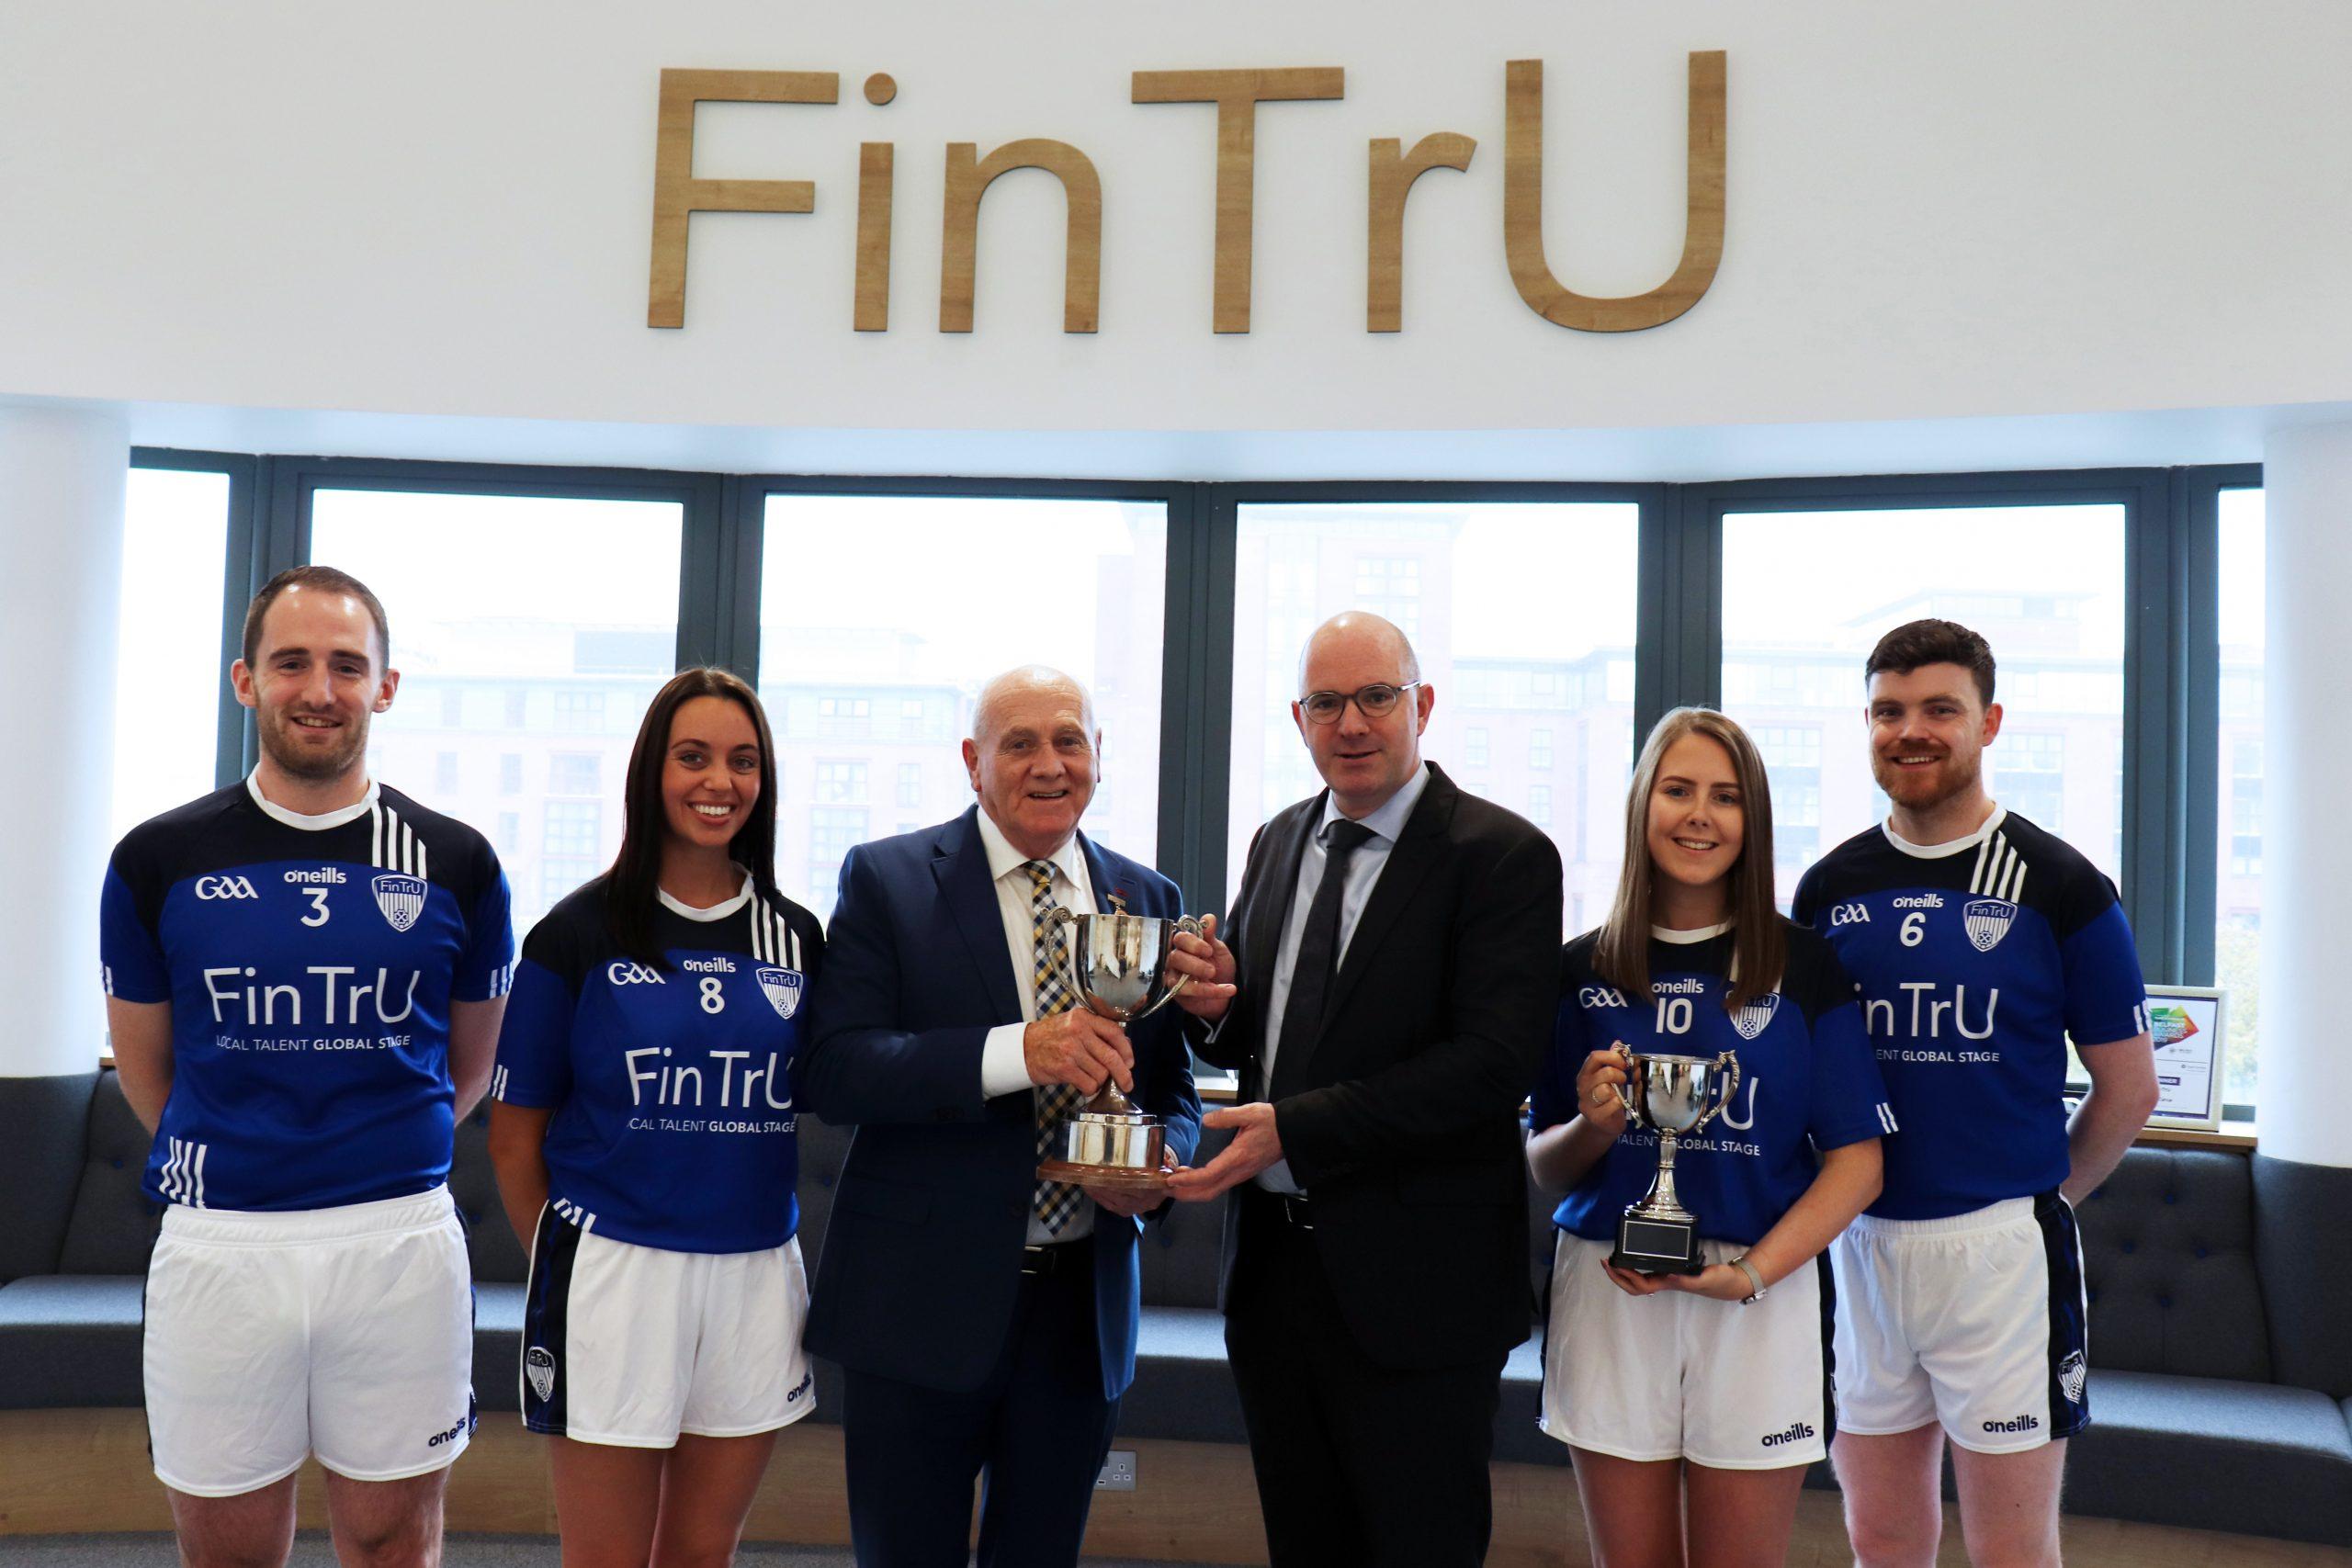 FinTrU continue their sponsorship of the Ulster GAA Inter-Firms